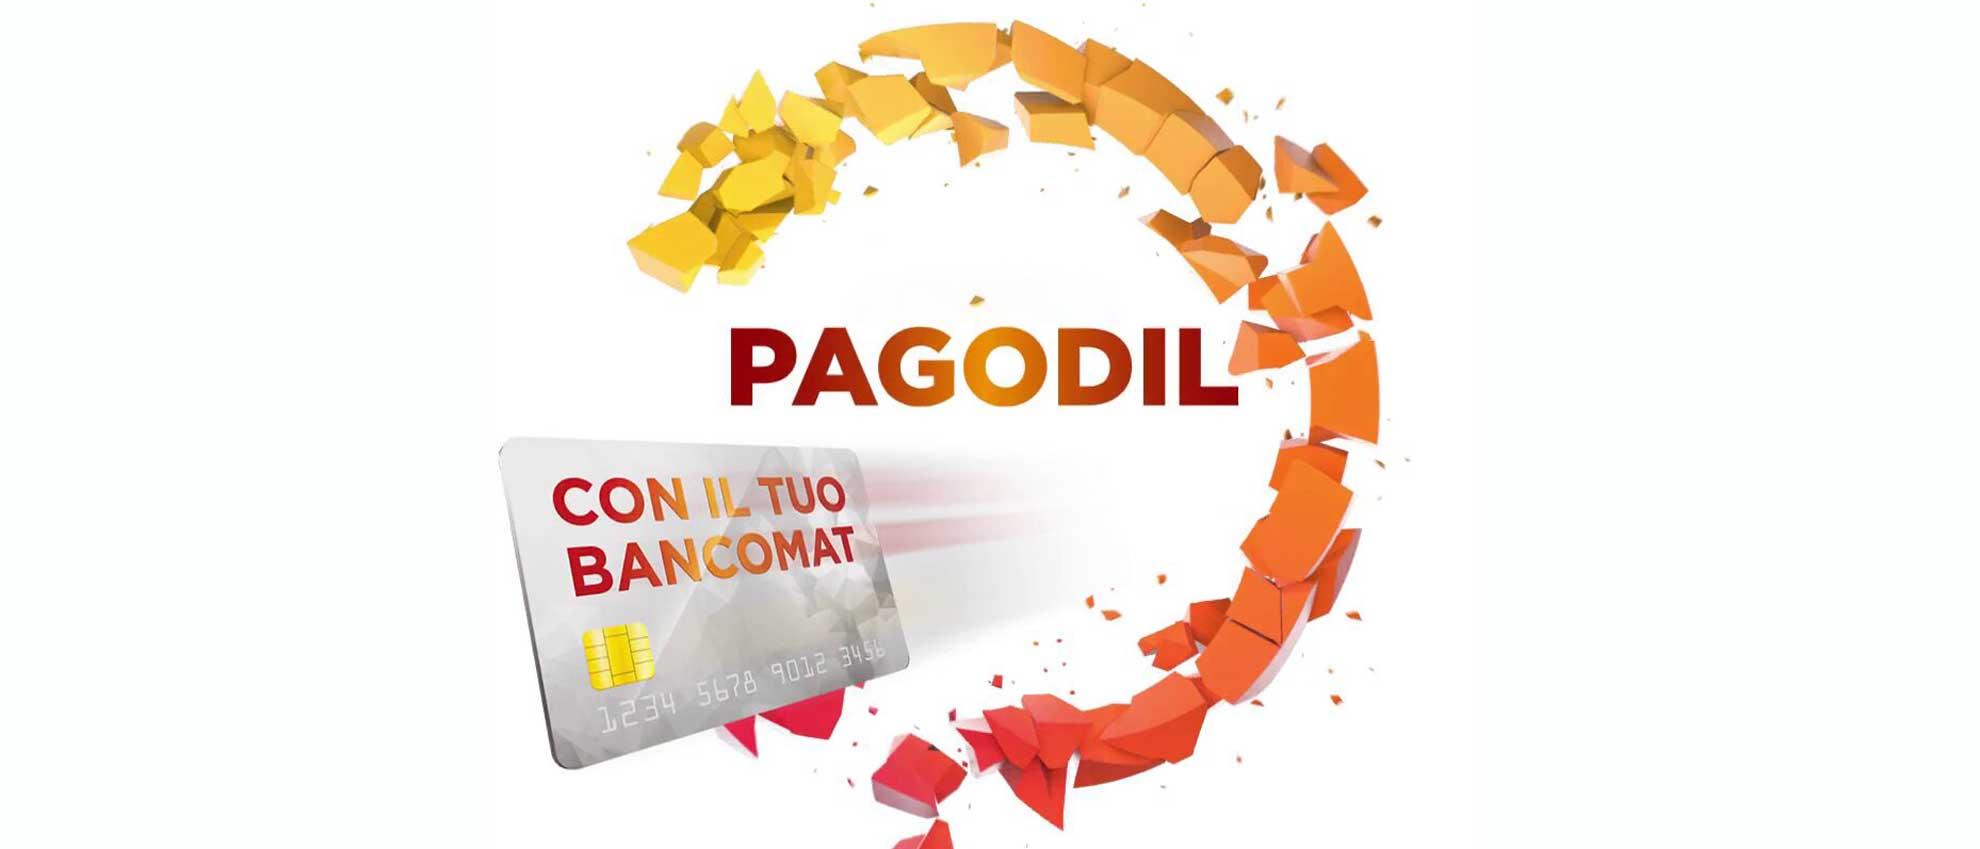 Banner pagodil by cofidis